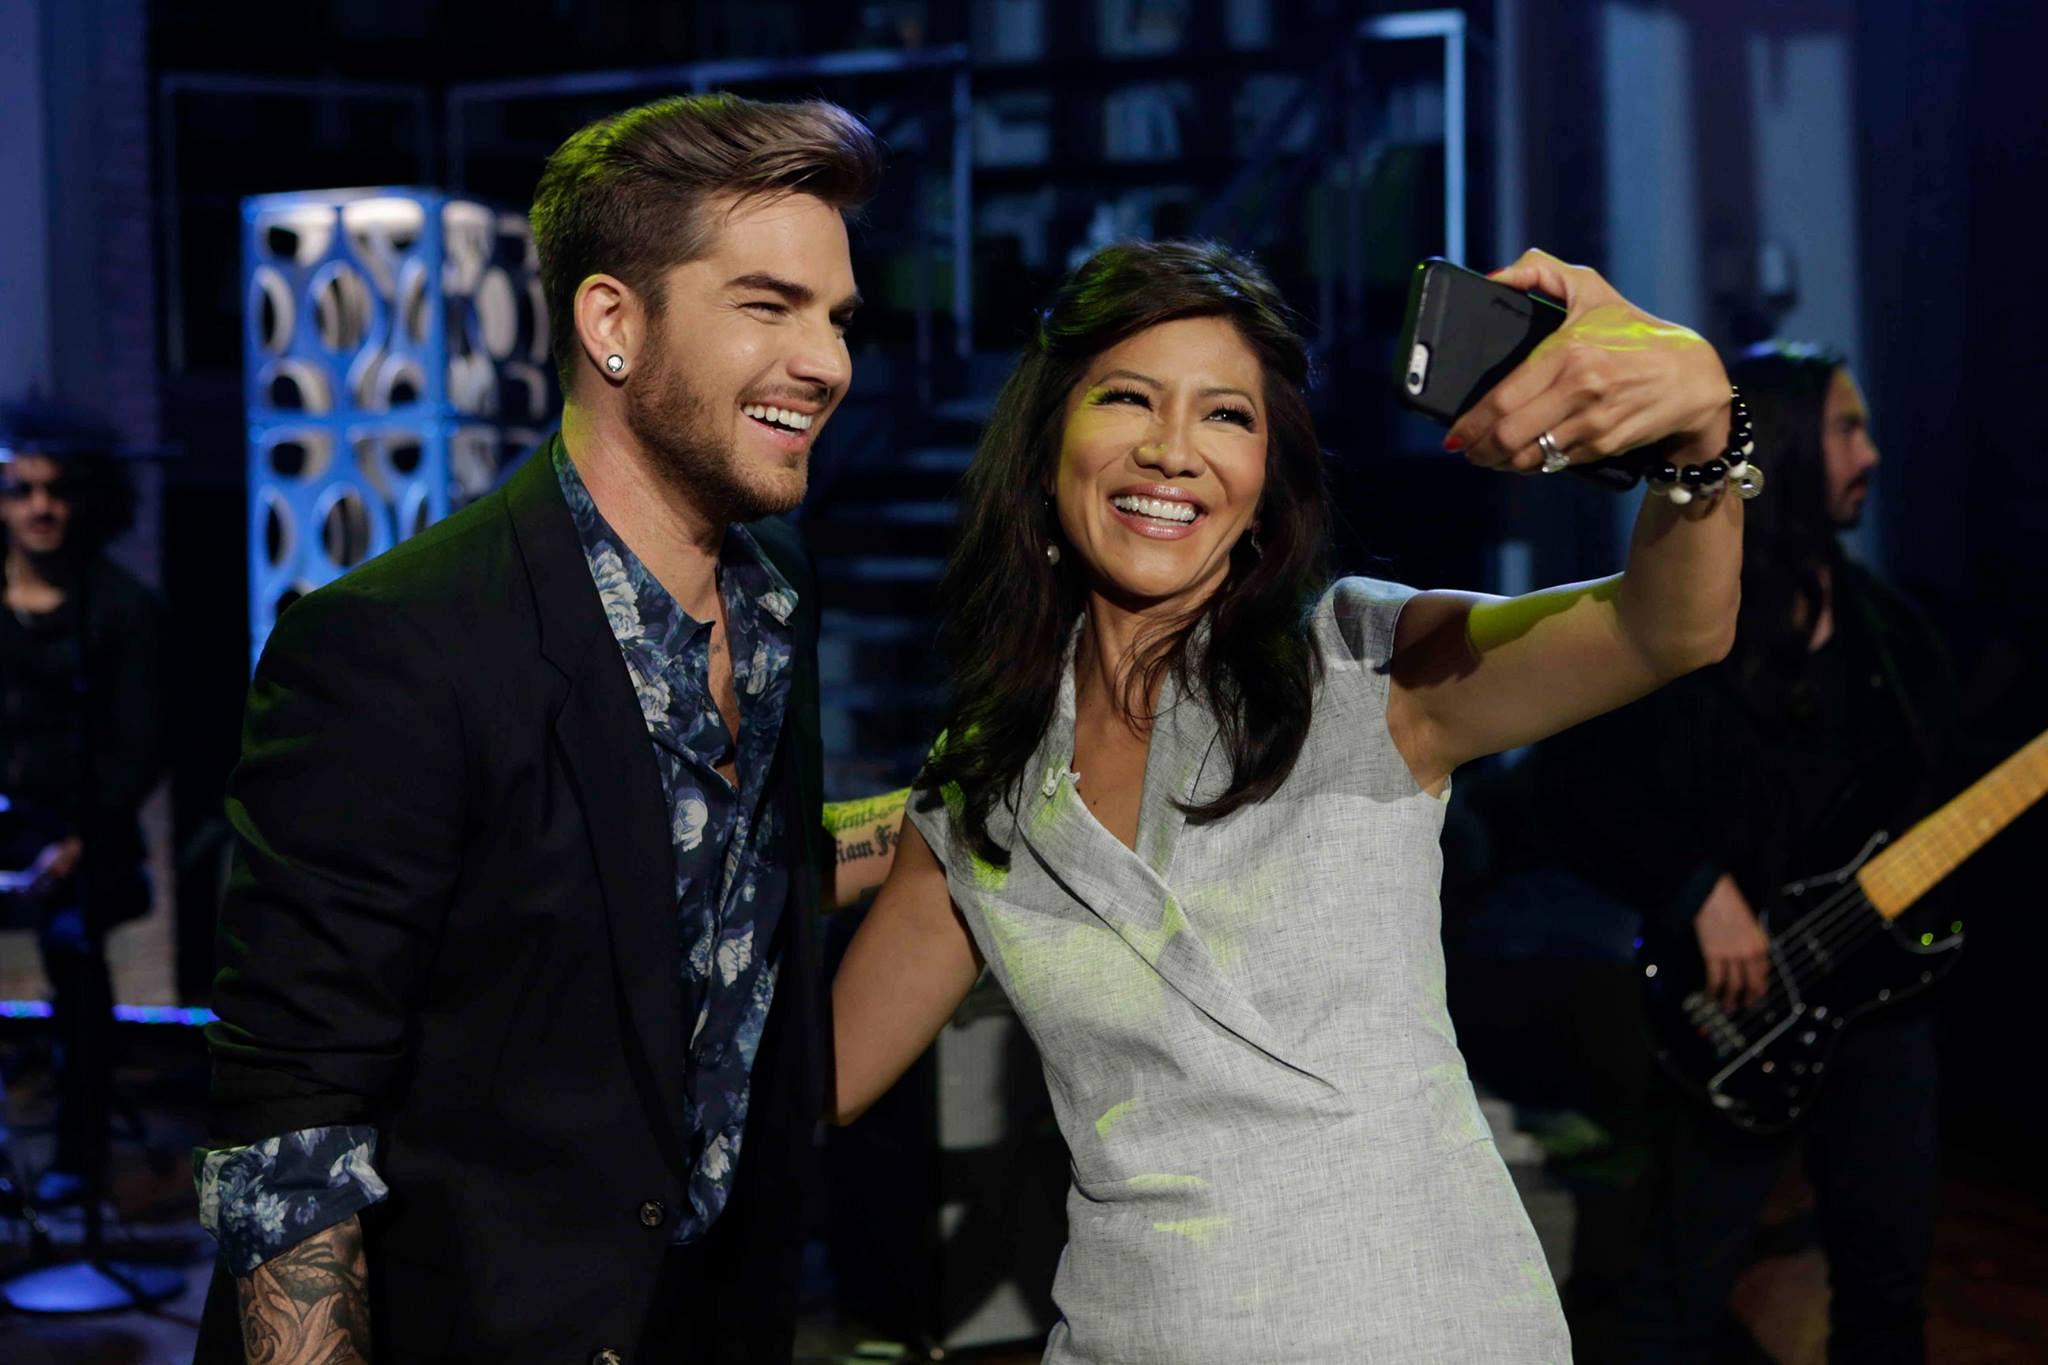 Julie had to have a selfie!